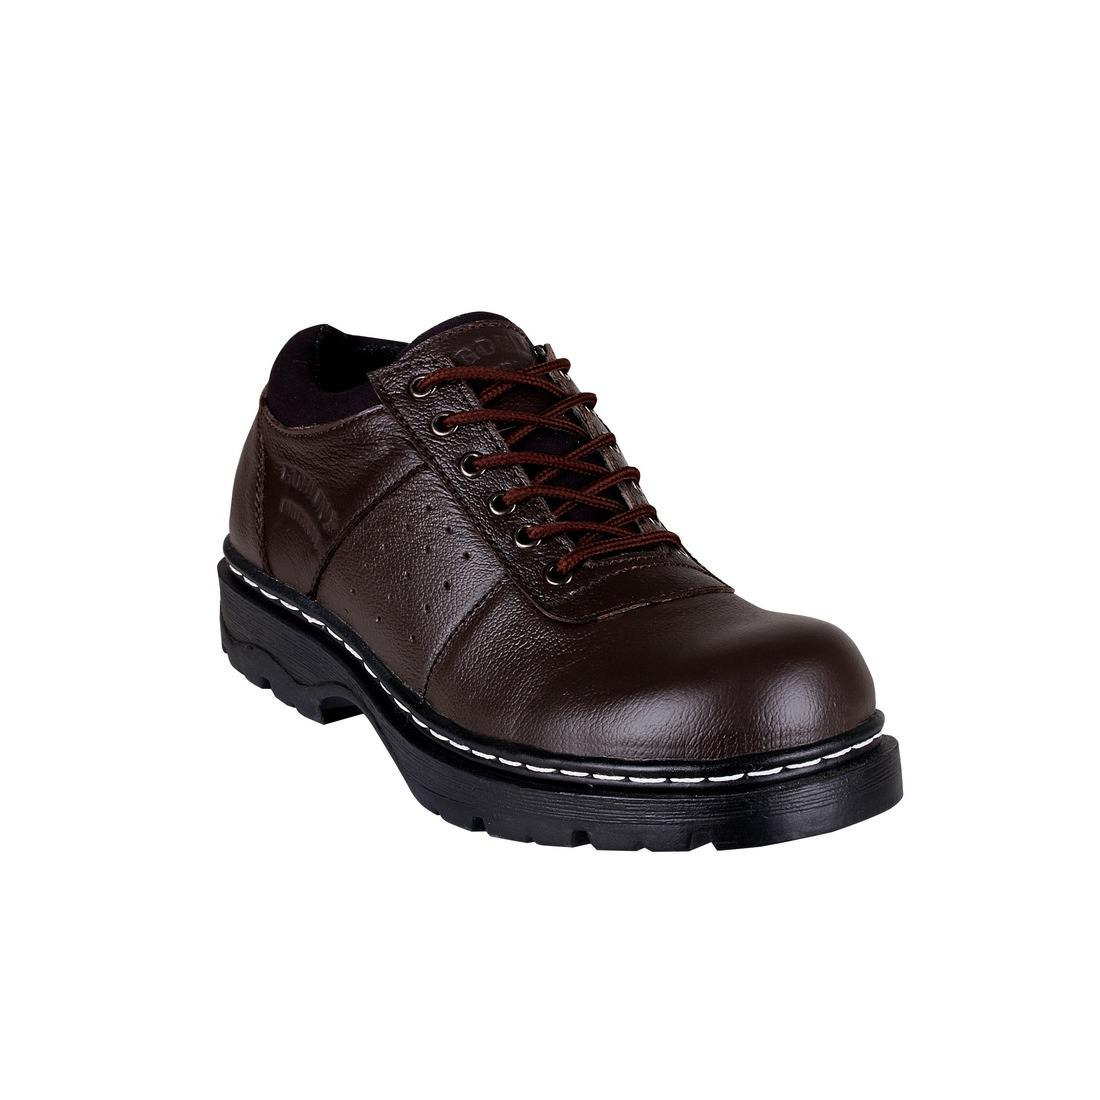 Blues Footwear Sepatu Pria Safety Boots Goblin Low Best Seller